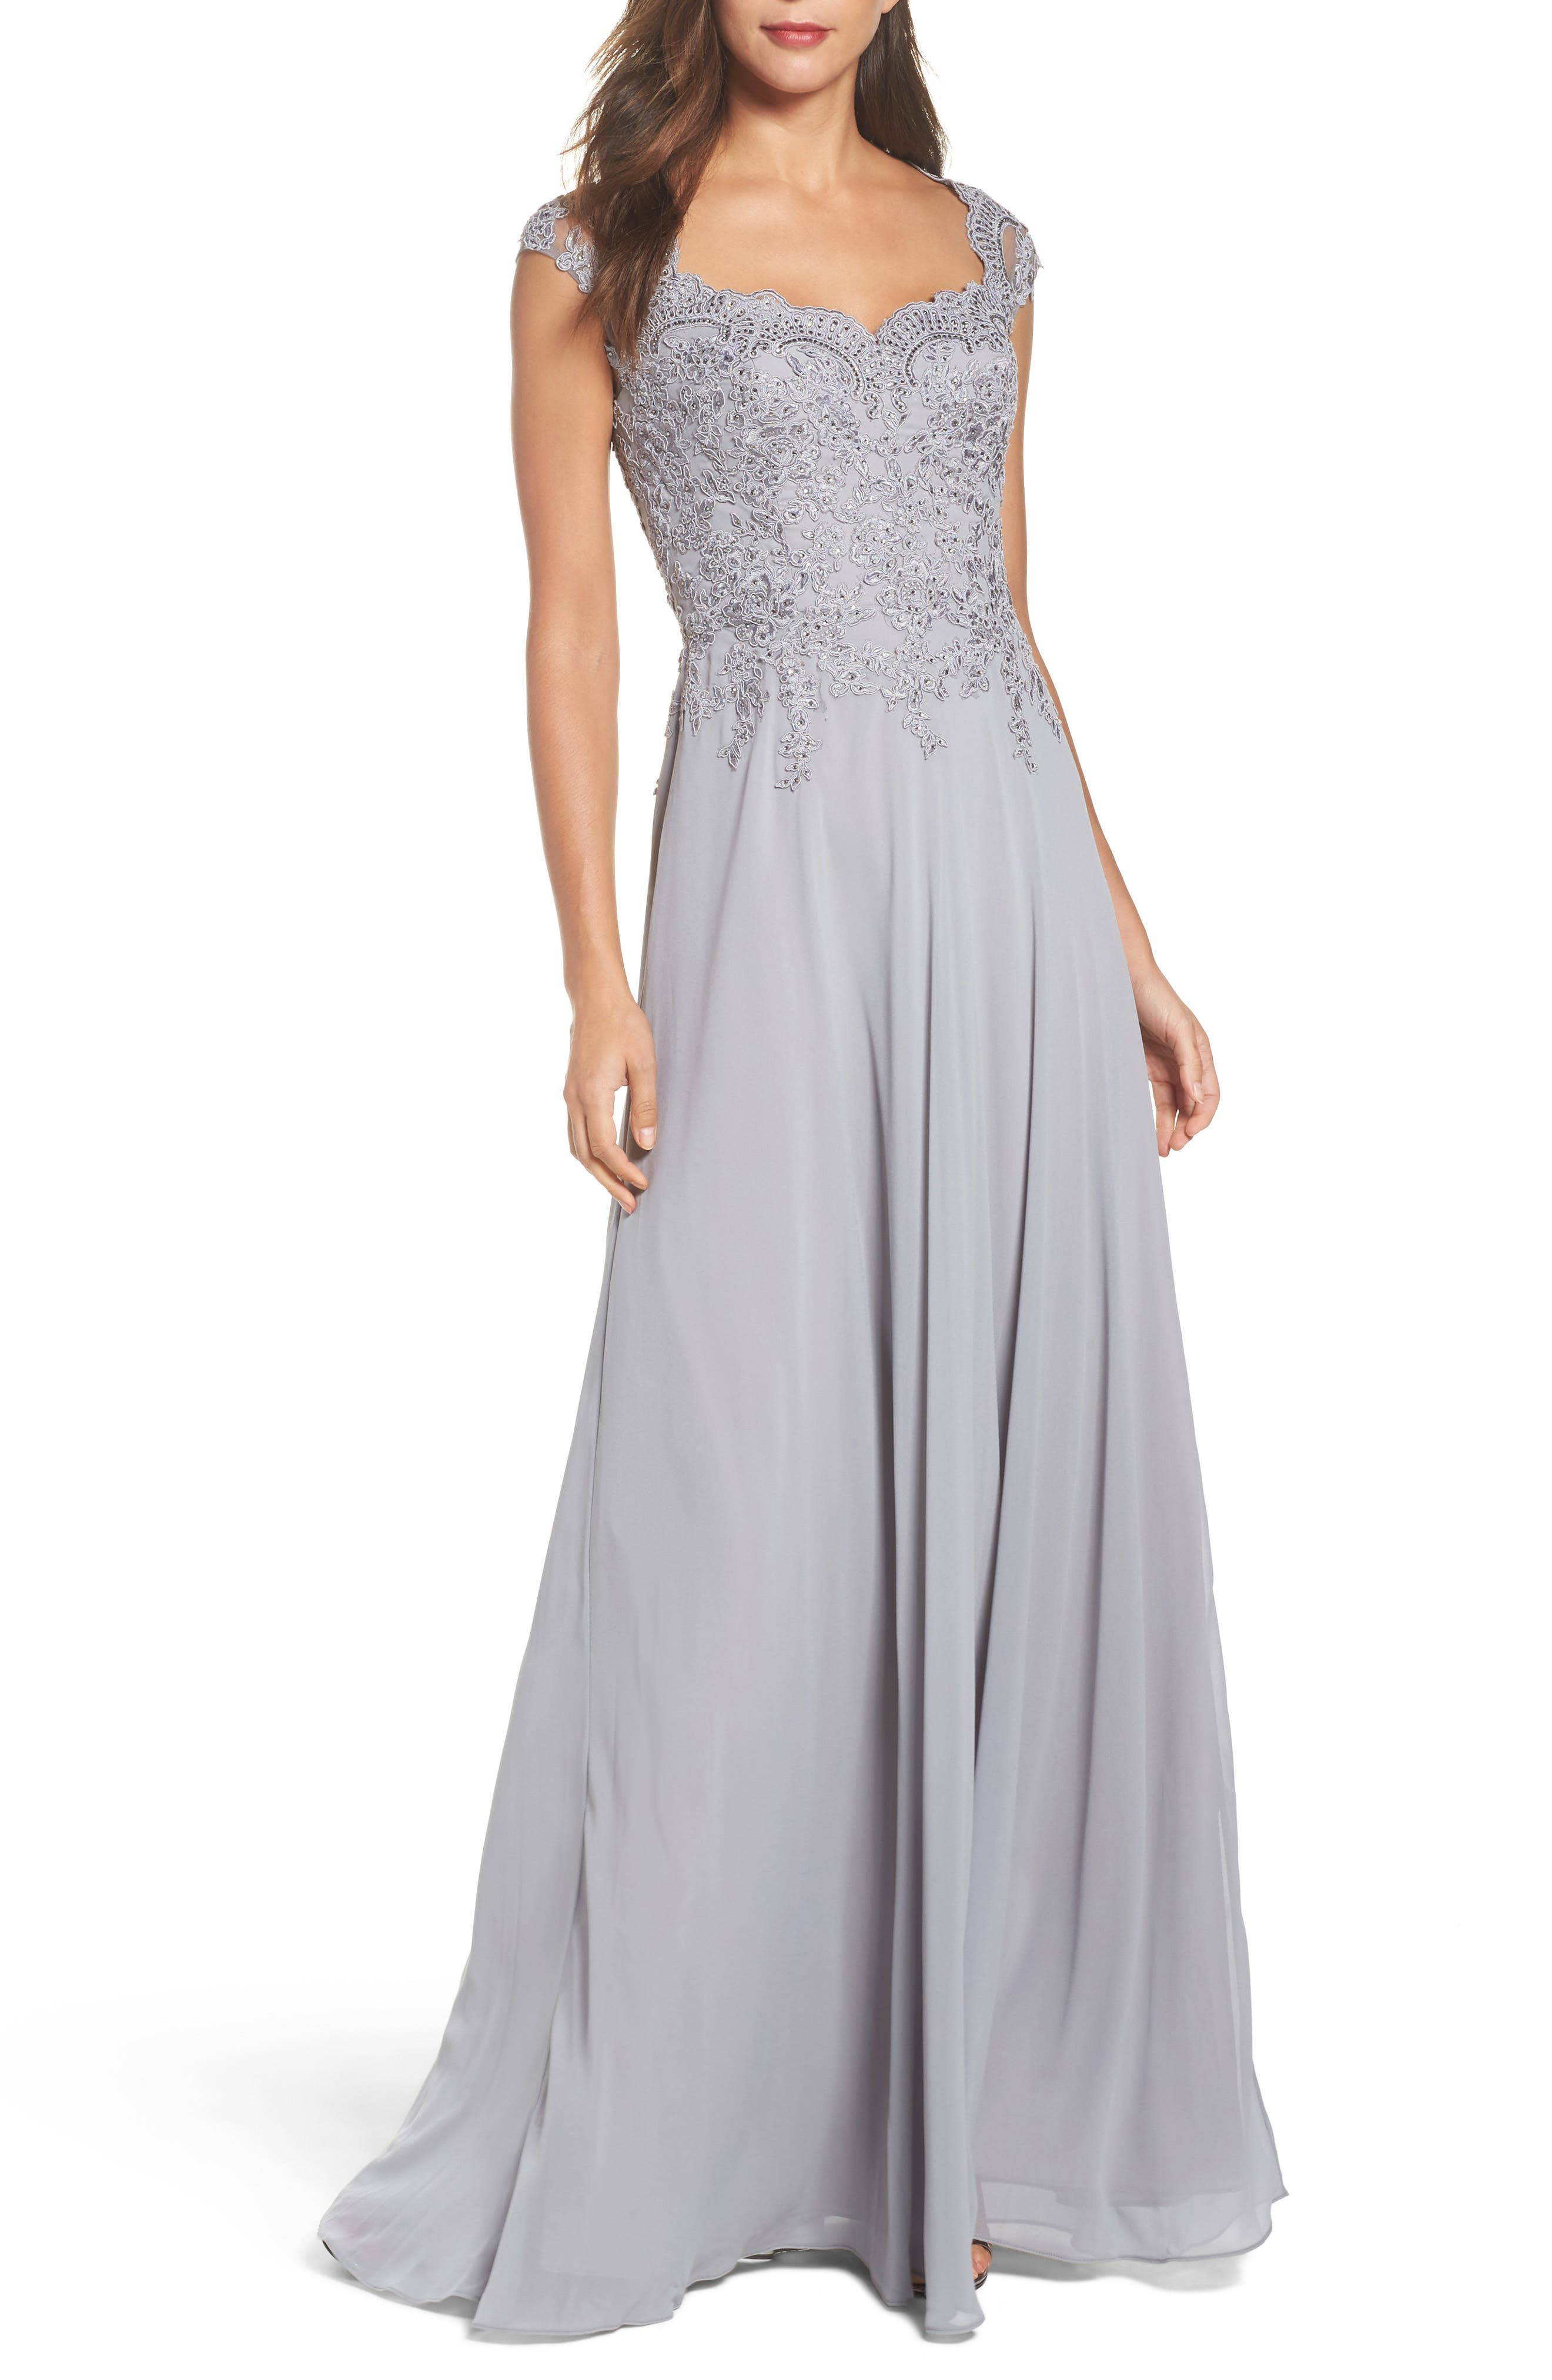 La Femme Embellished Cap Sleeve Gown, Metallic